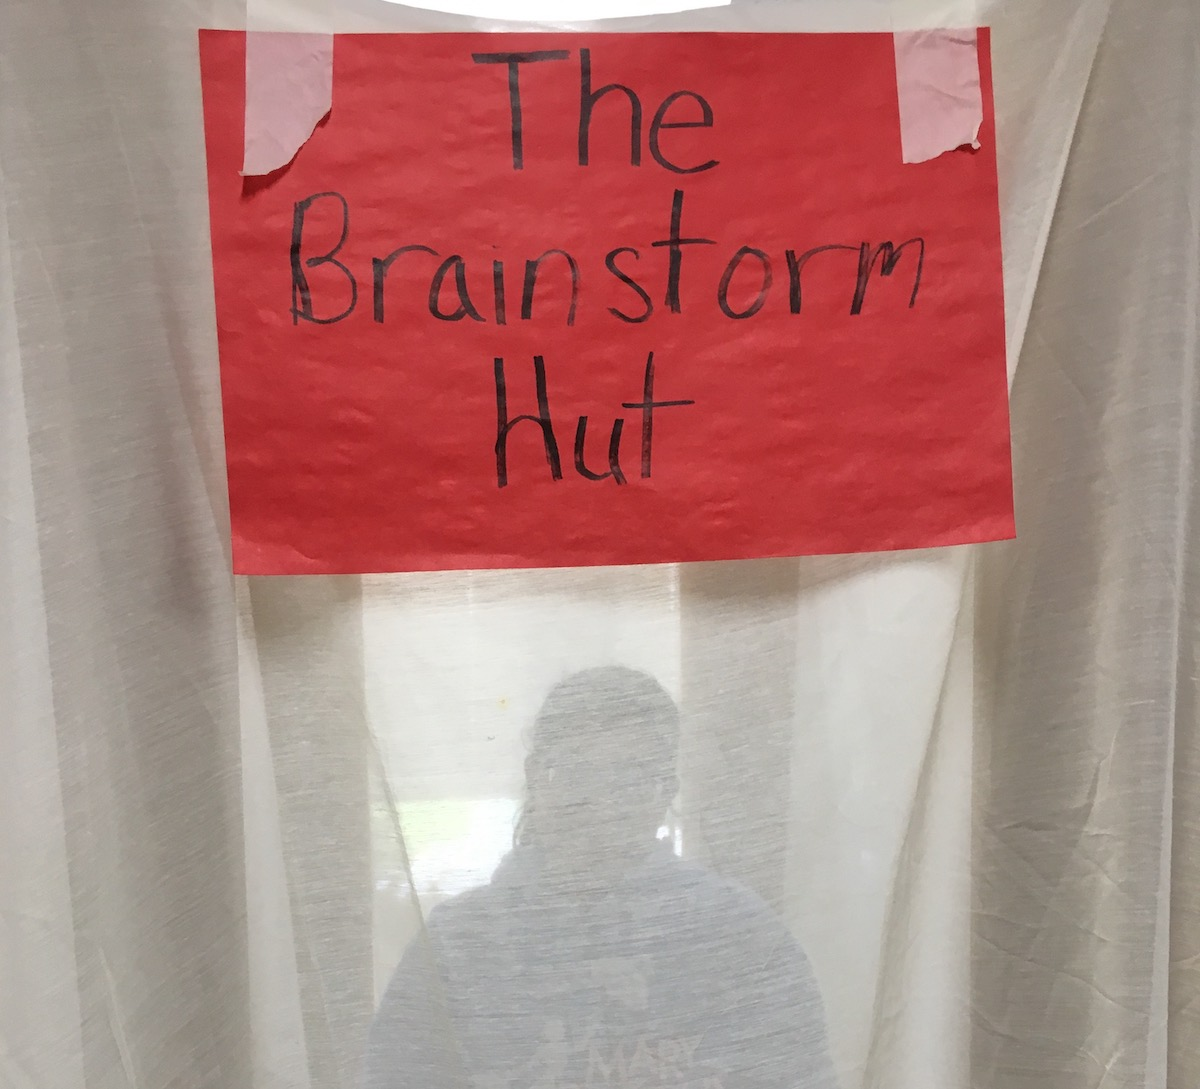 human figure in a brainstorm brainstorm hut